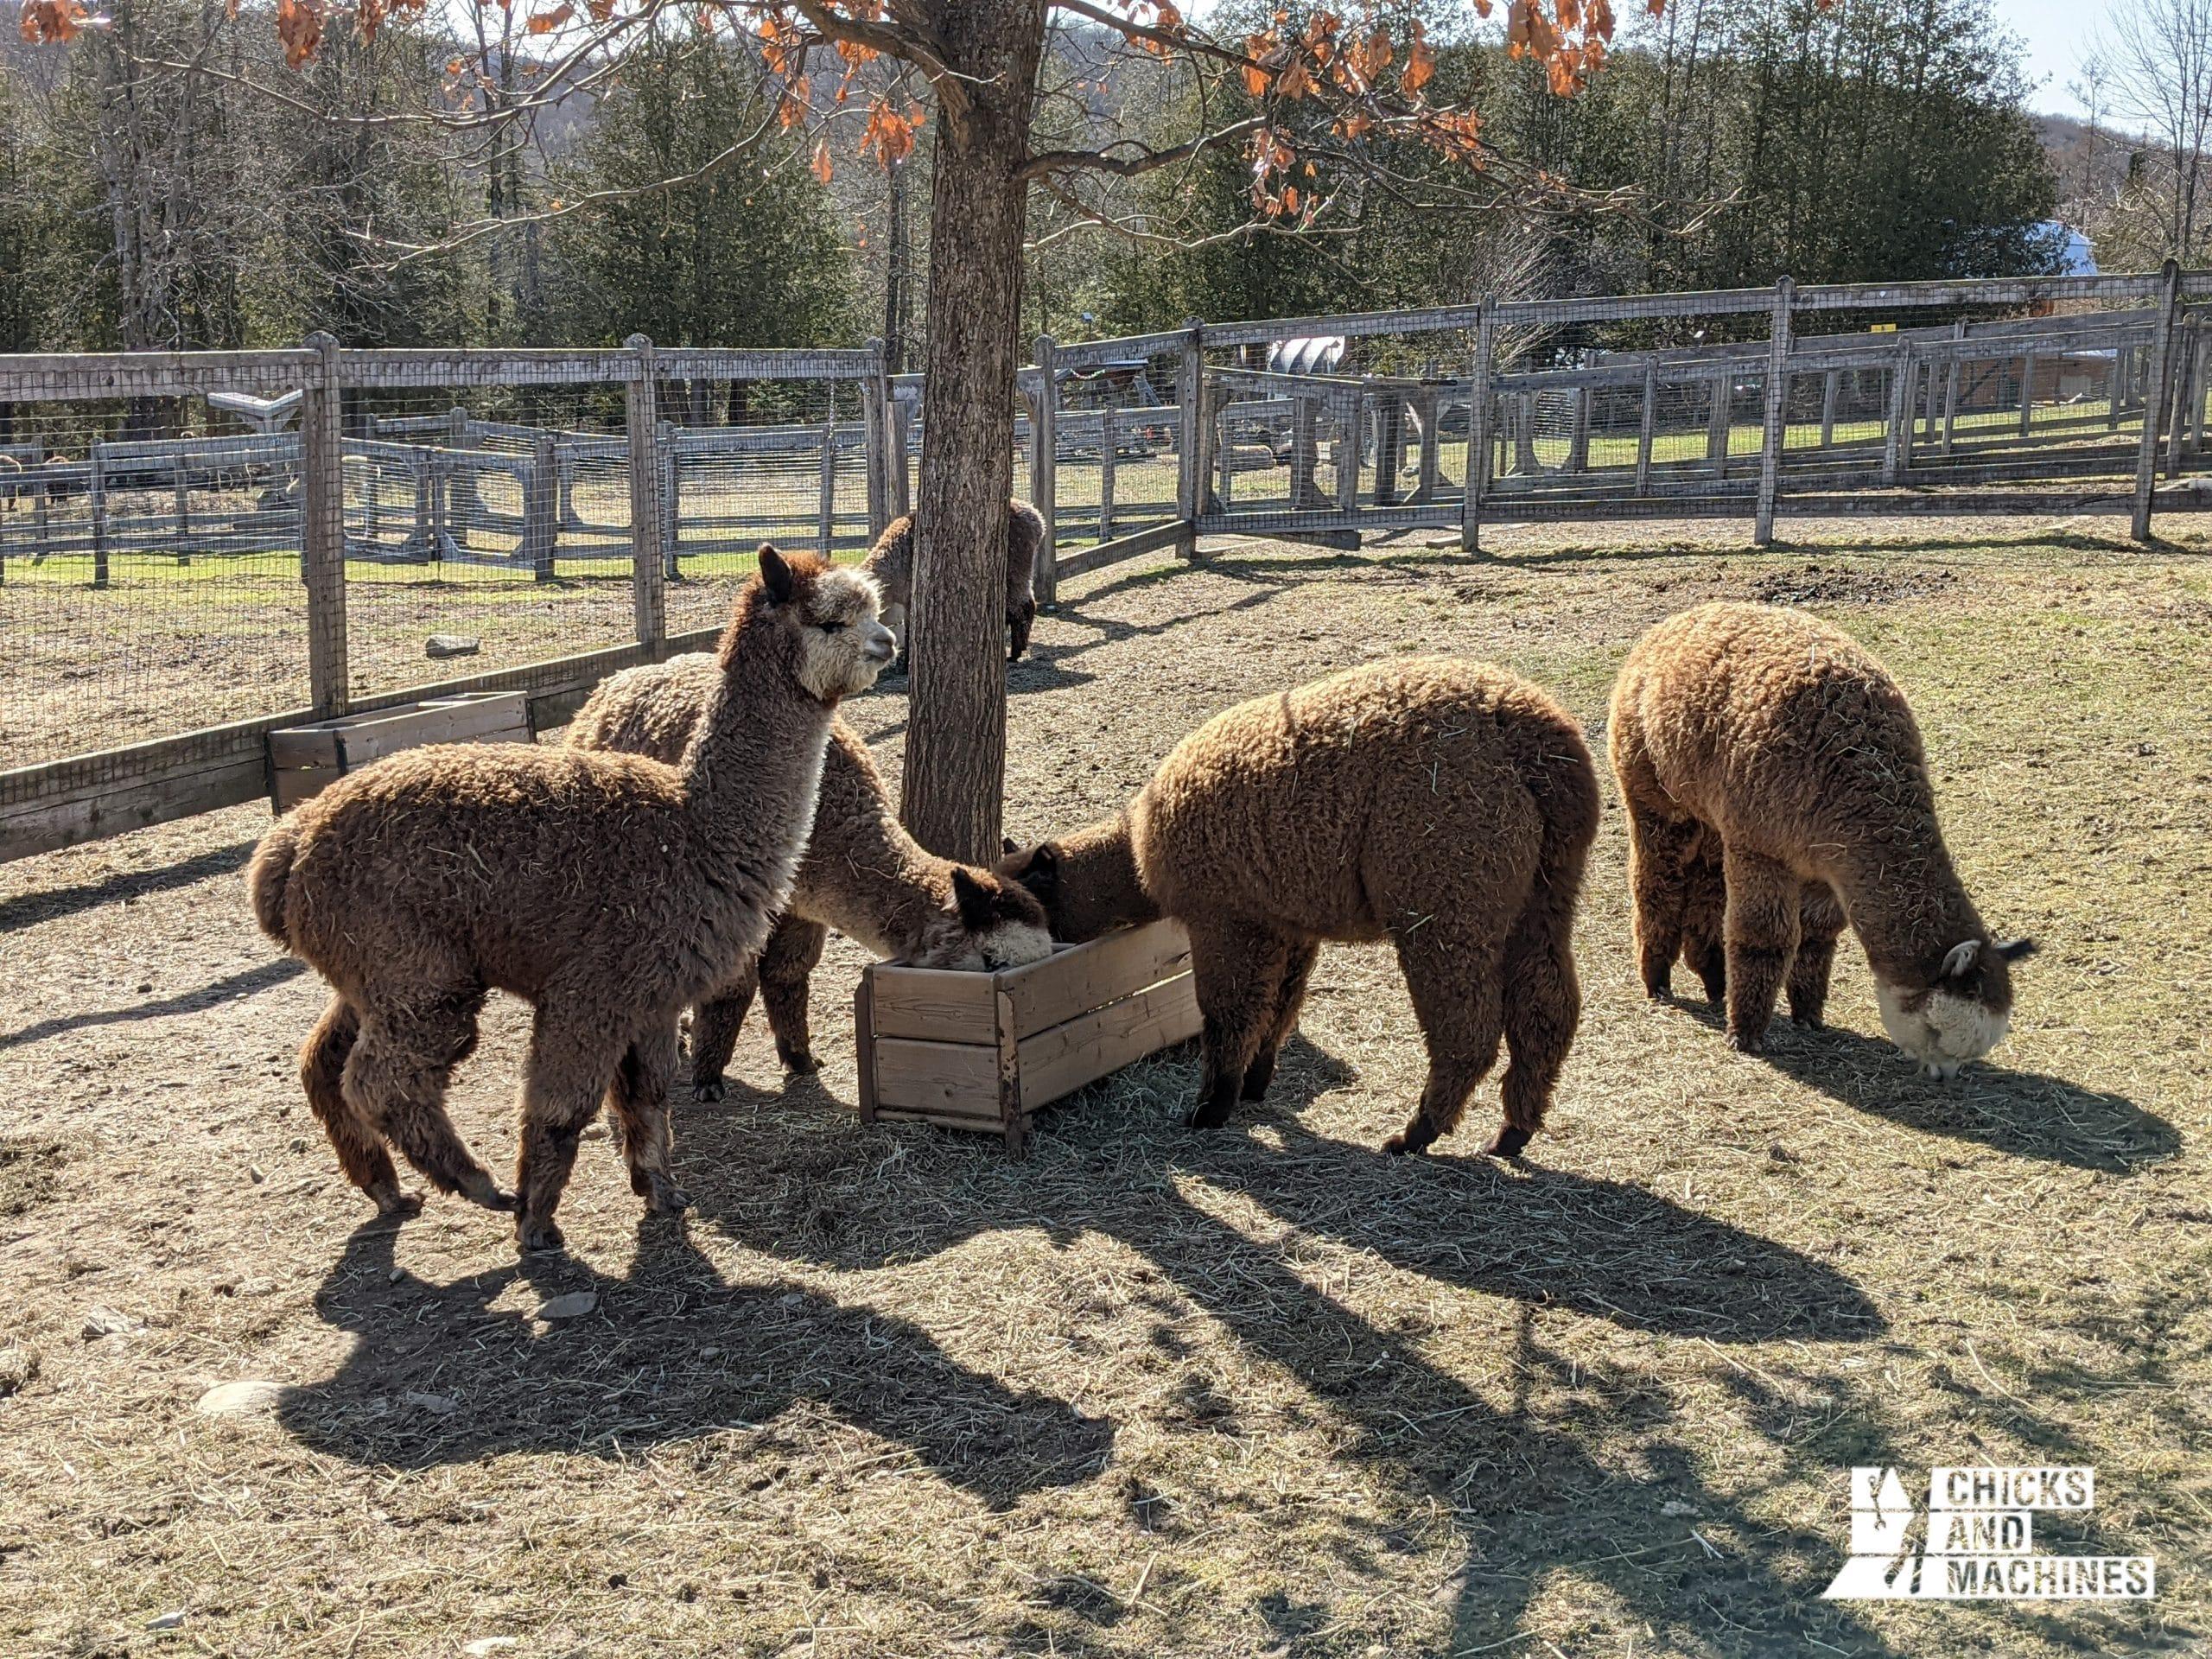 A visit to our friends the alpacas!